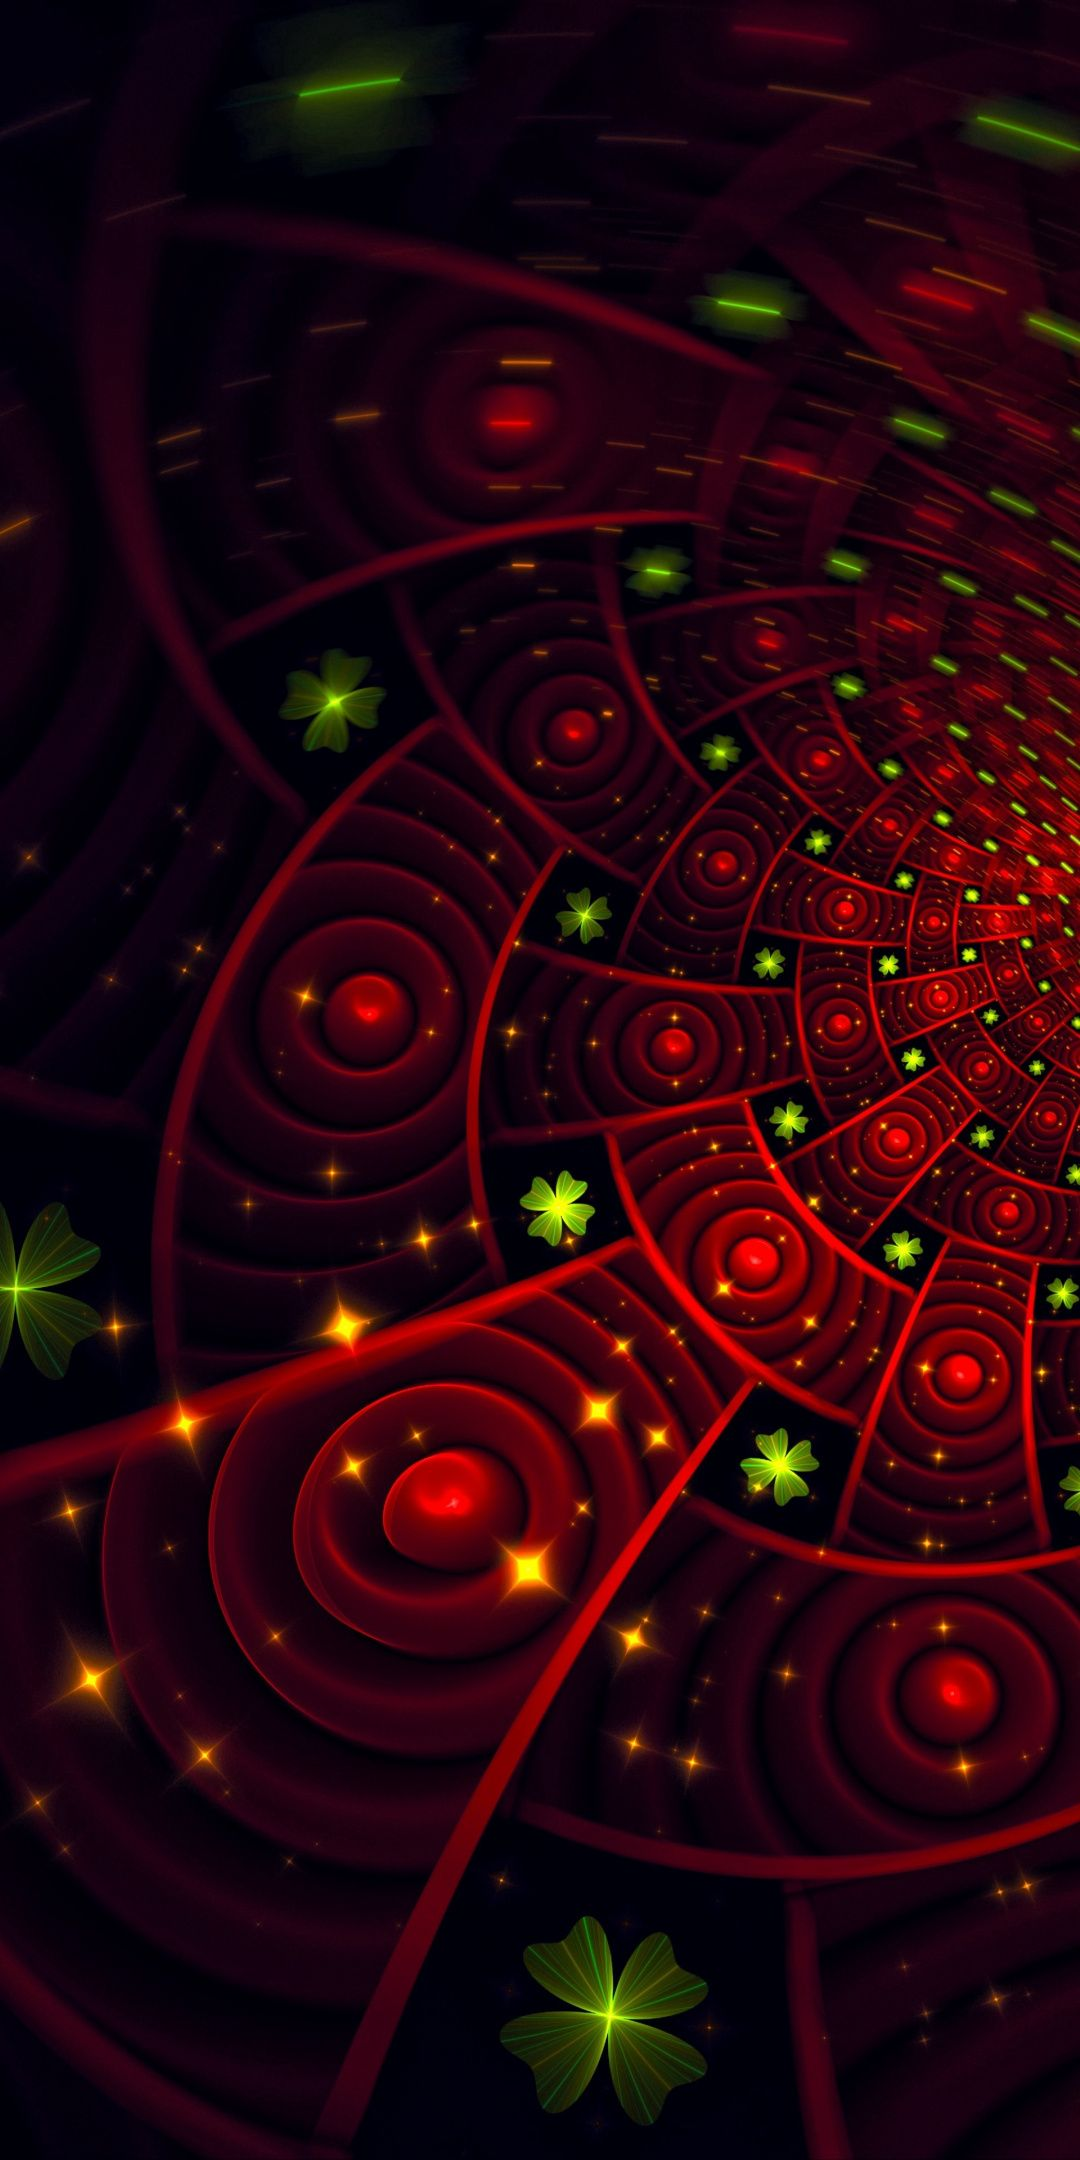 1080x2160 Fractal Patterns Glowing Red Green Pattern Wallpaper Graffiti Wallpaper Pattern Wallpaper Fractals